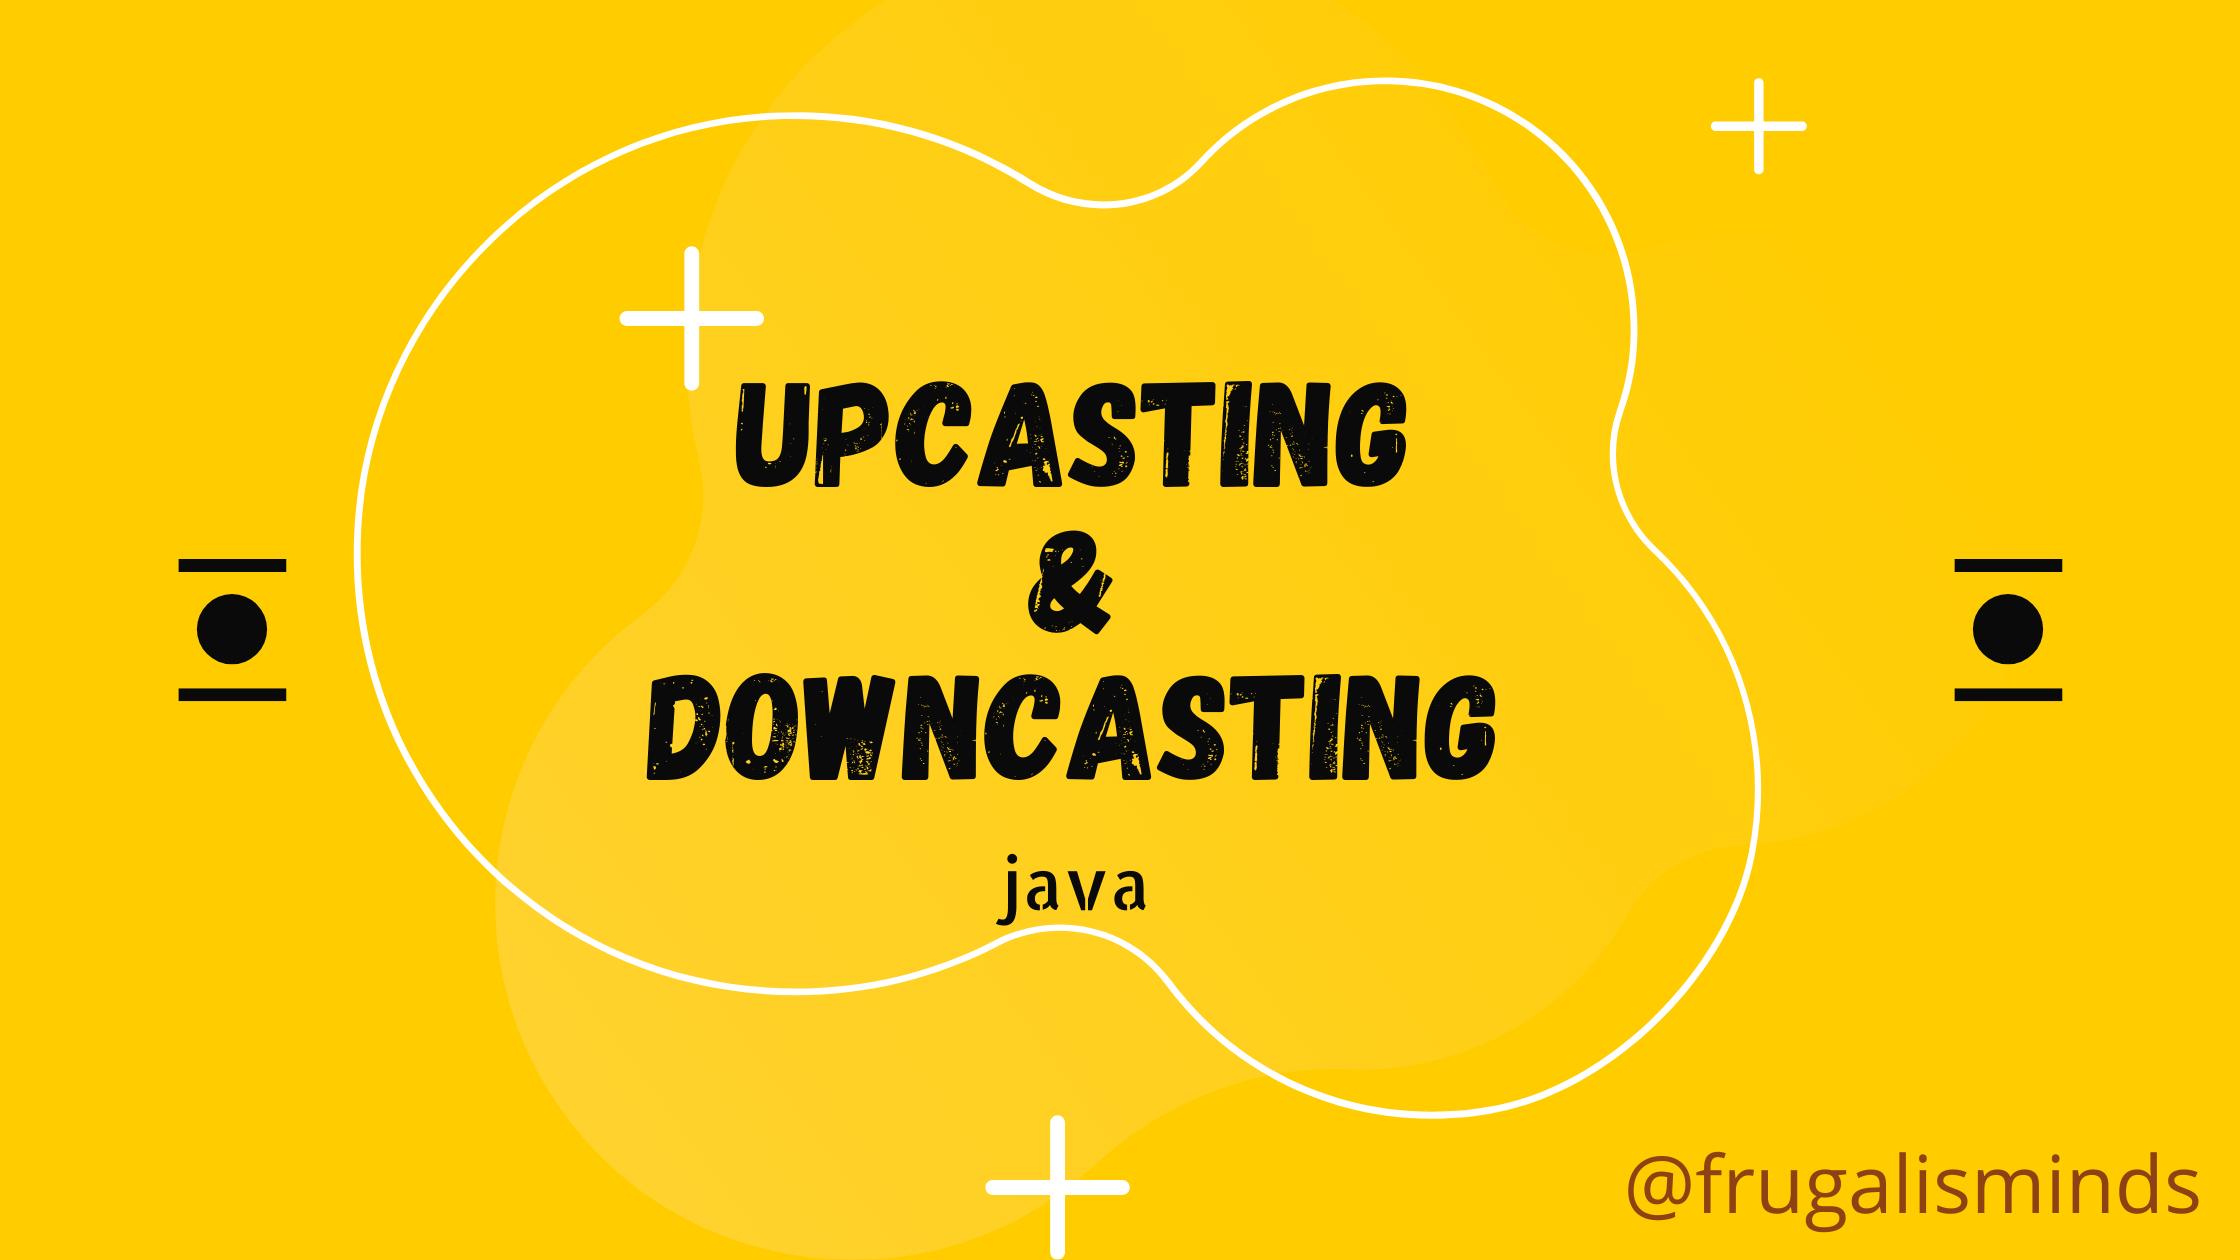 upcasting and downcasting java